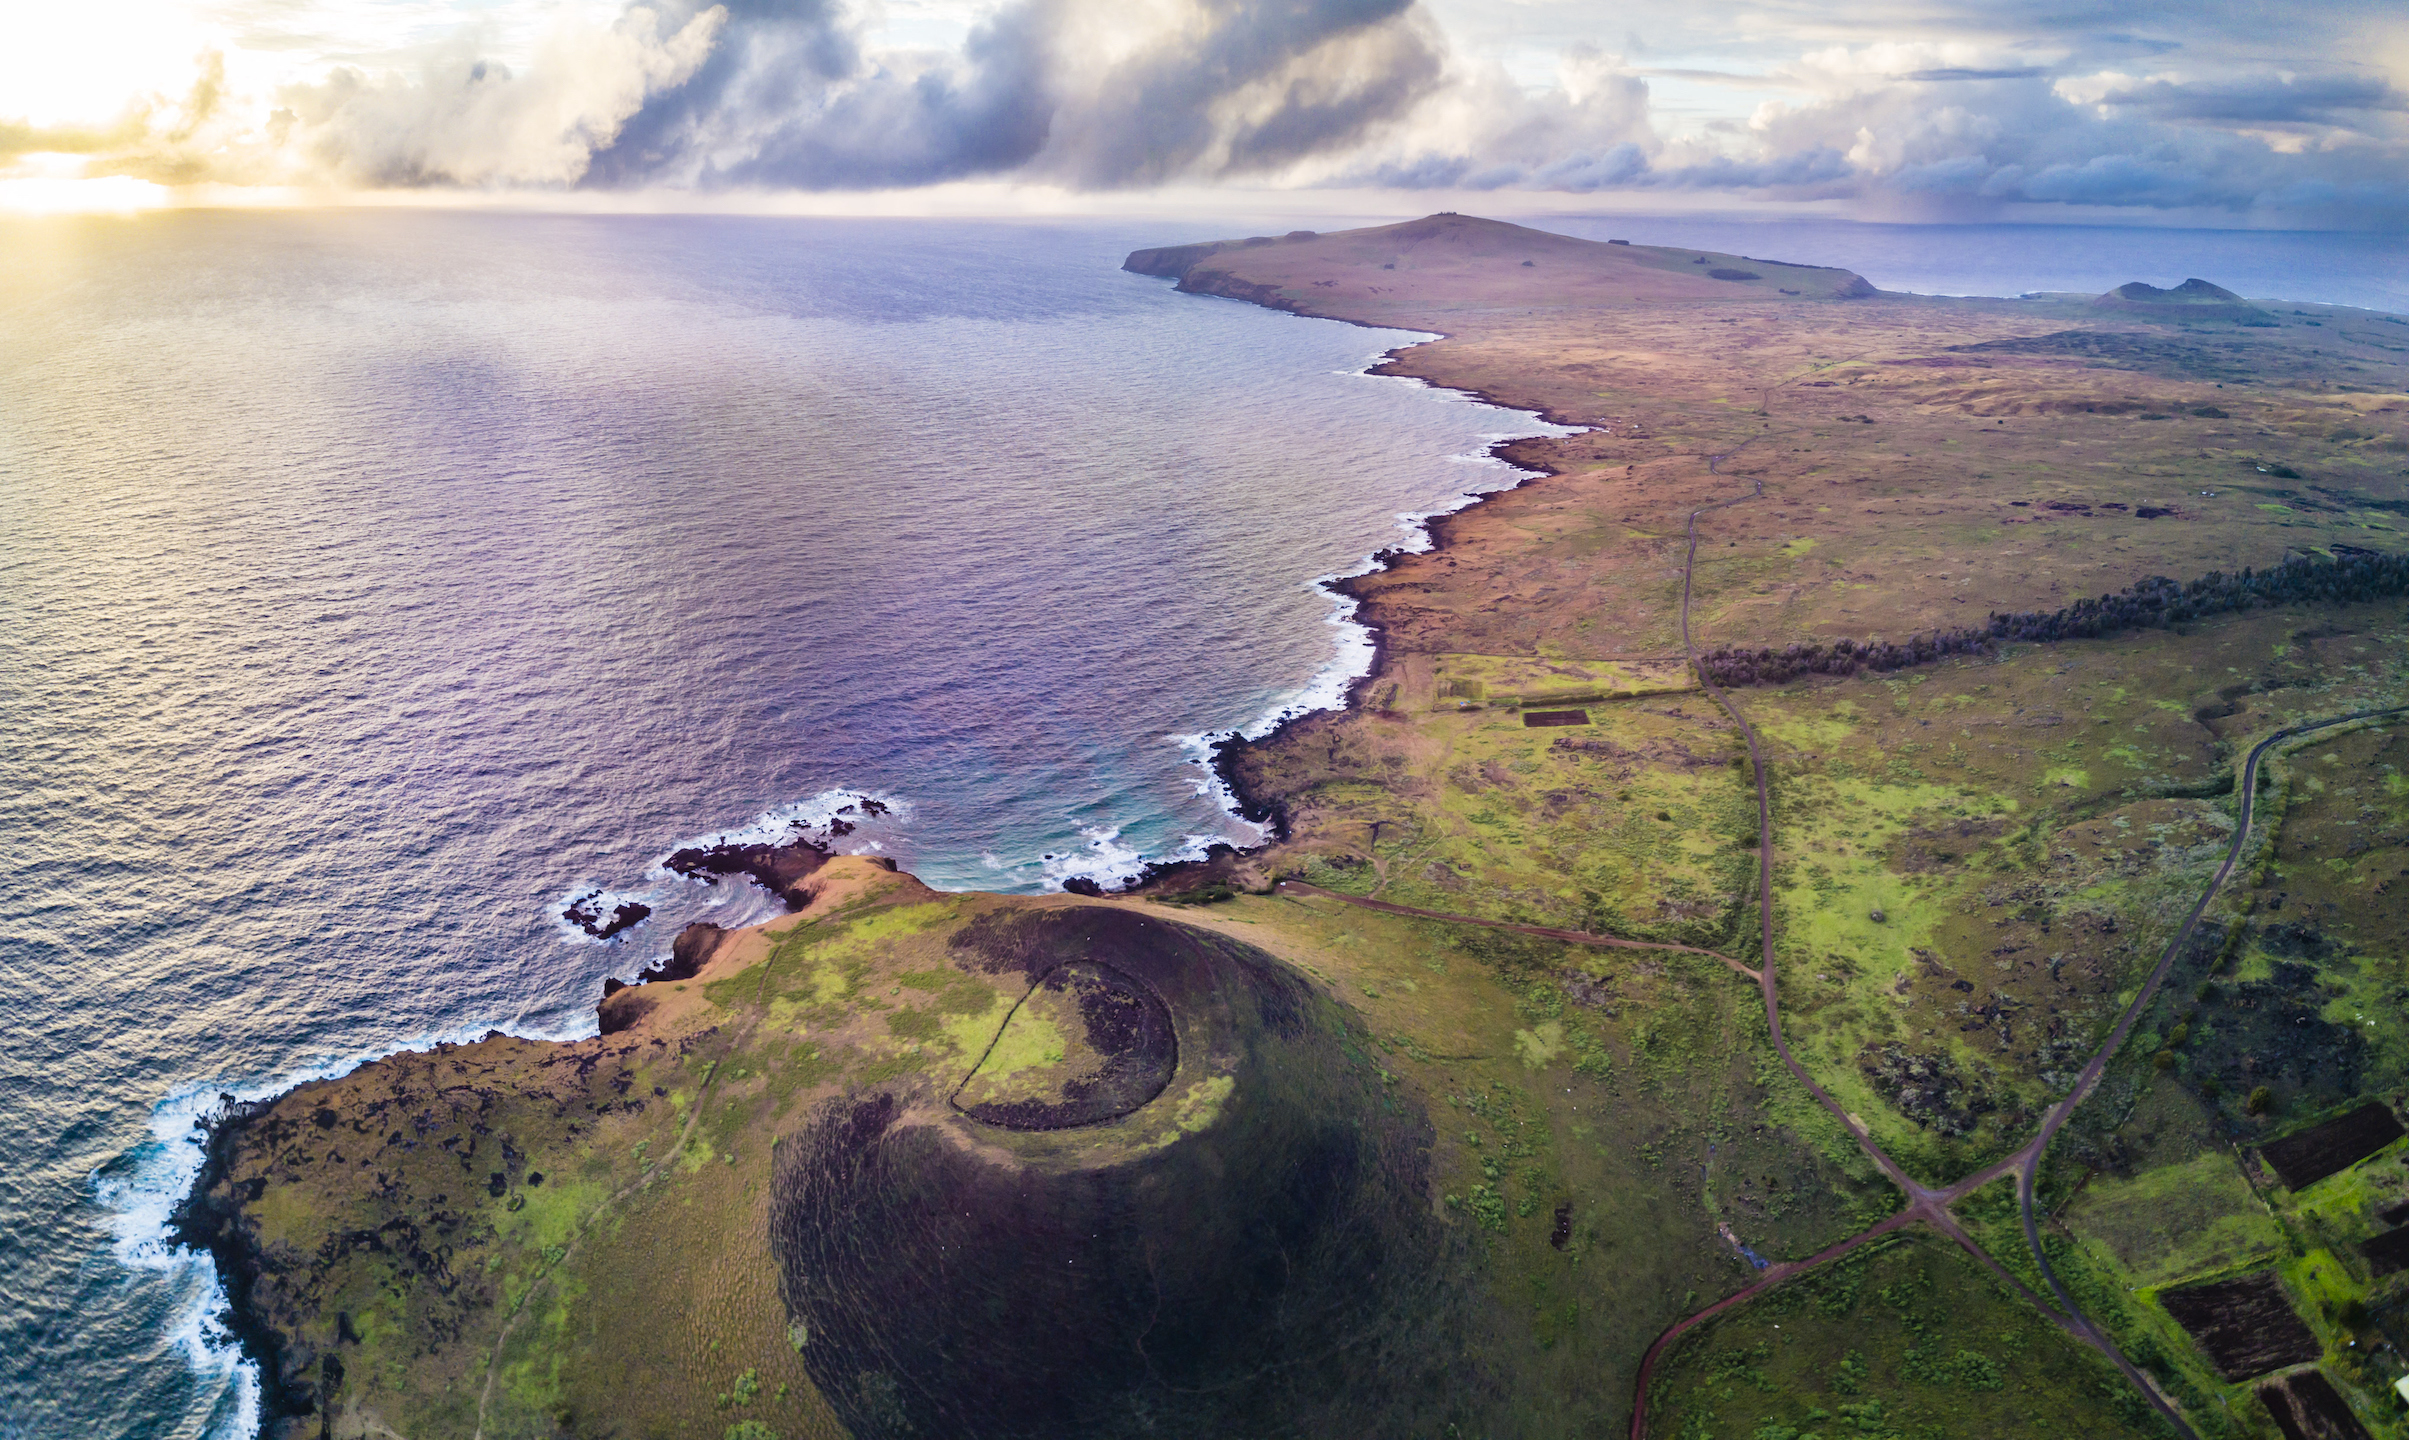 Aerial view of island coastline